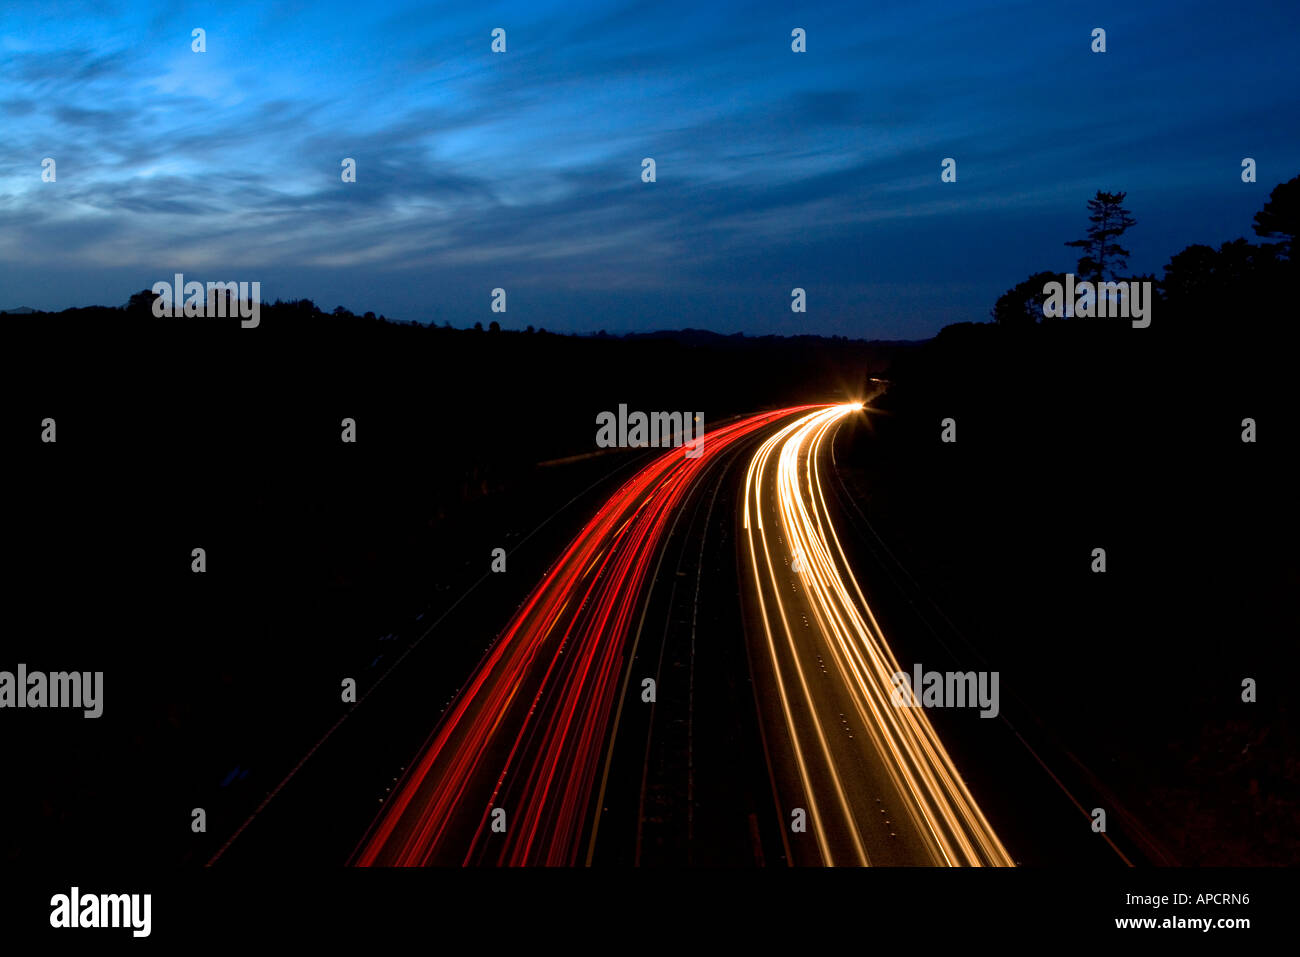 Motorway Traffic at night on SH1 Auckland New Zealand - Stock Image